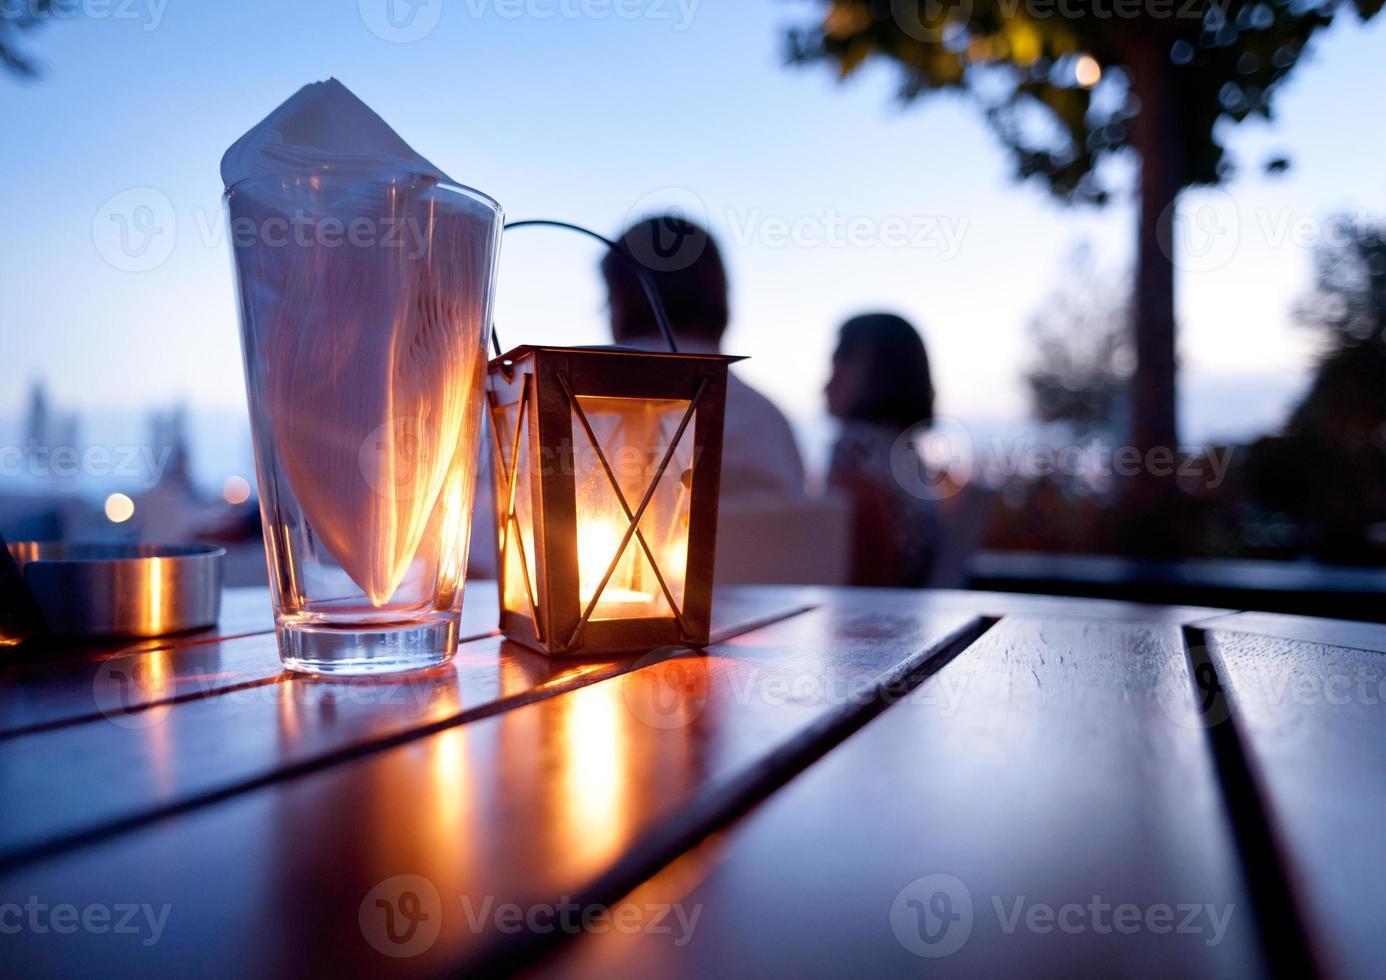 tavolo ristorante mediterraneo foto